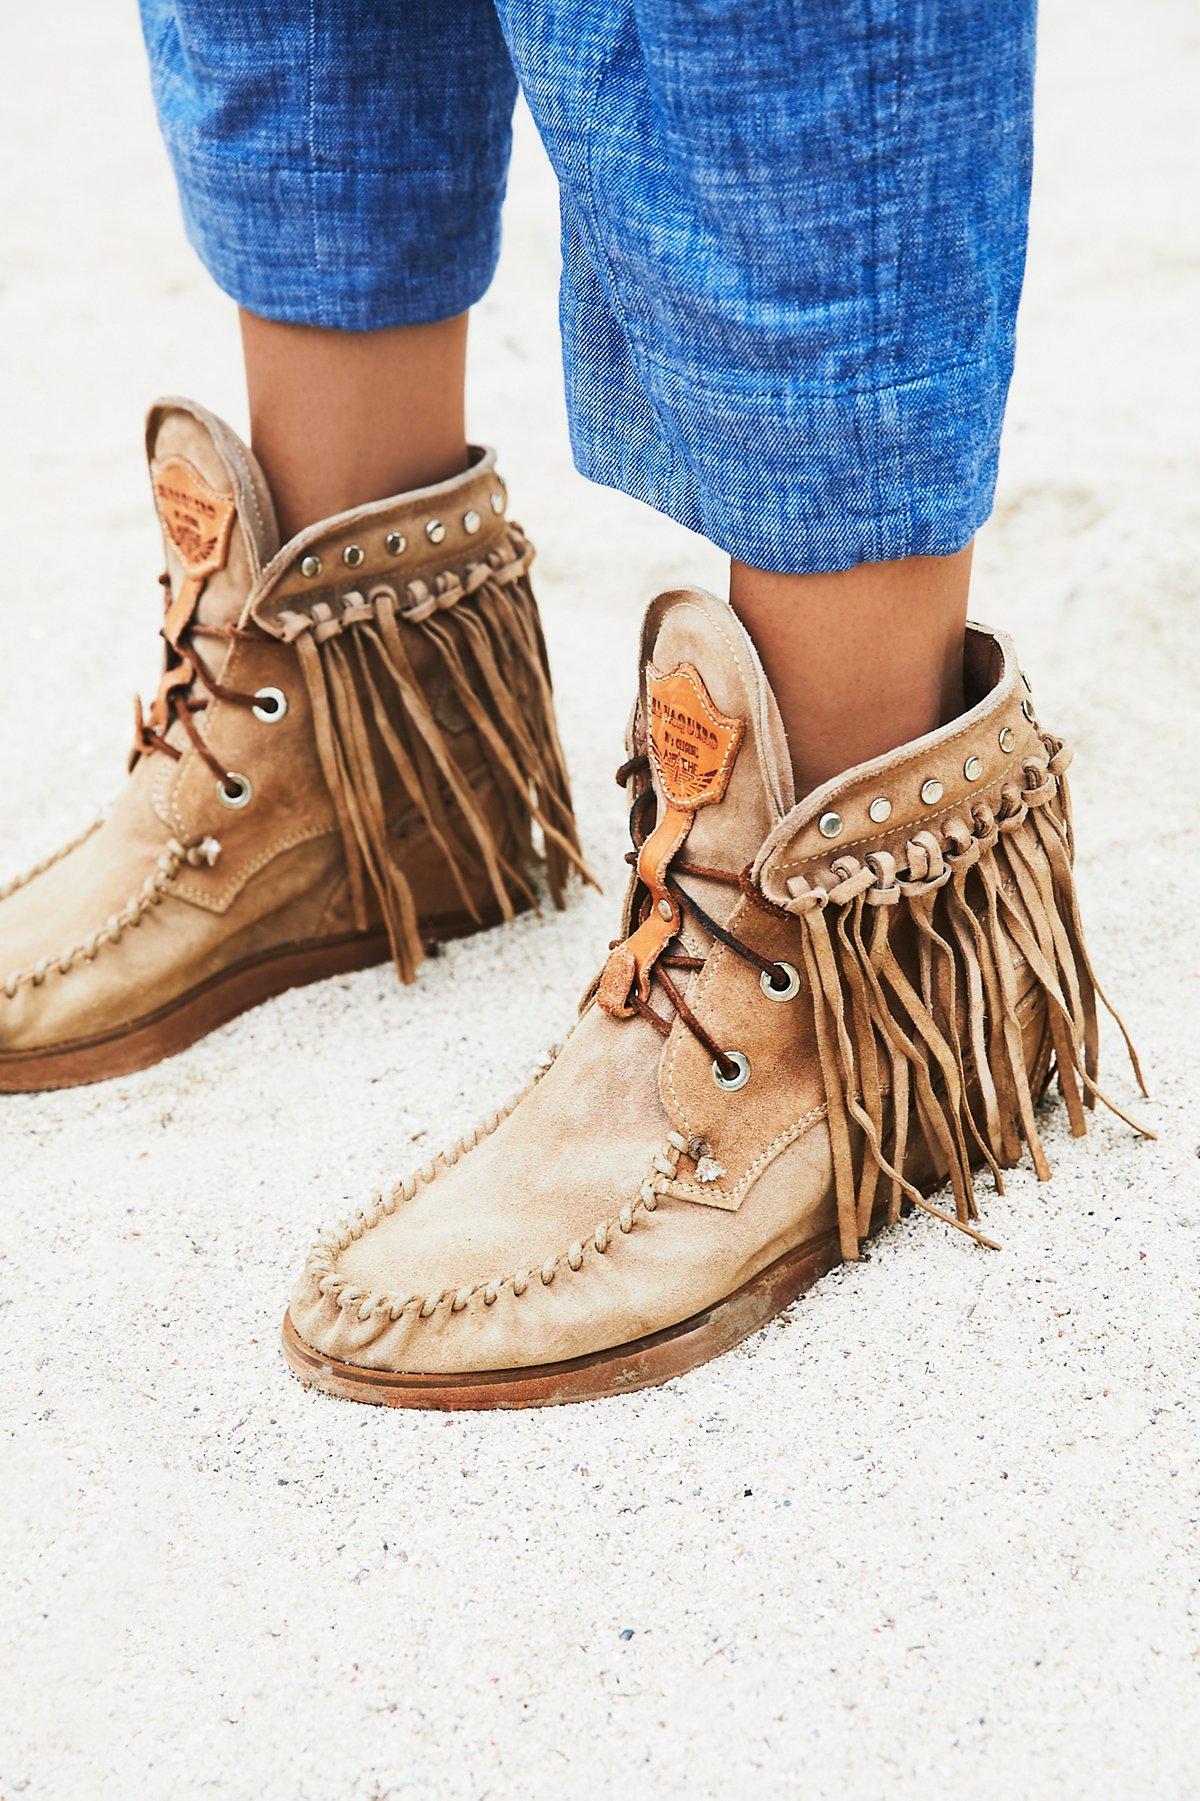 Roseland莫卡辛靴